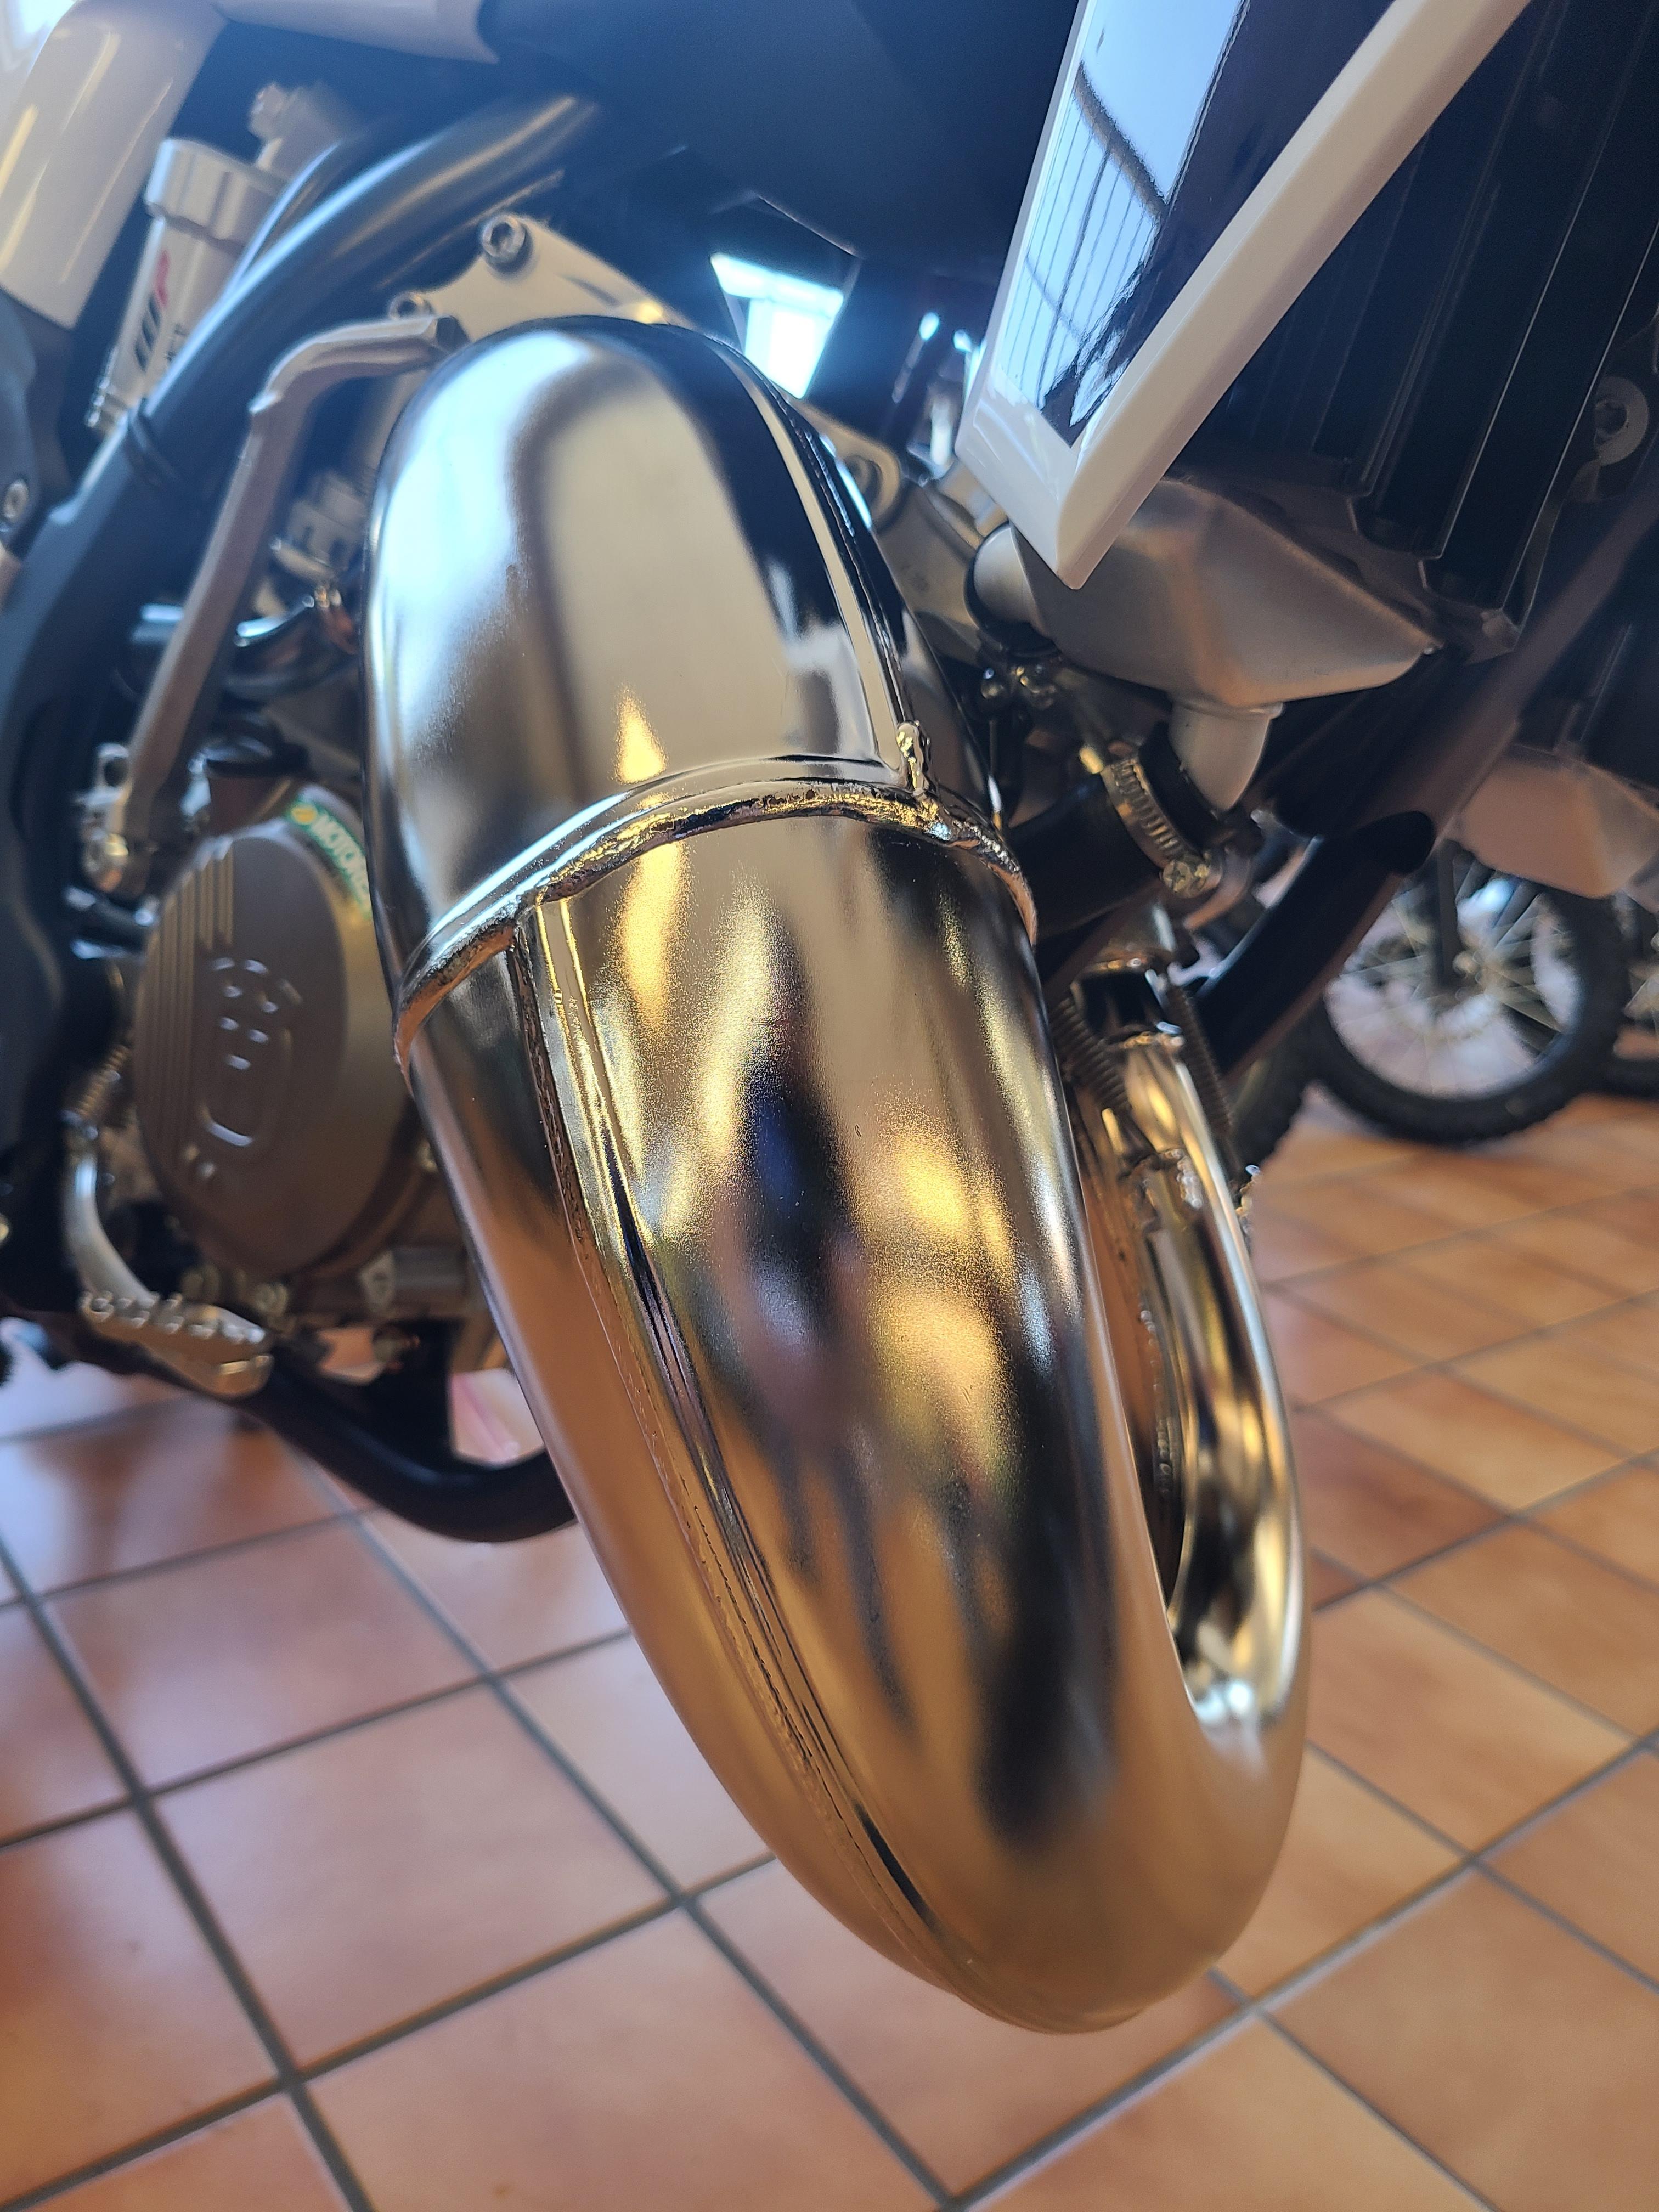 2022 Husqvarna TC 125 at Bobby J's Yamaha, Albuquerque, NM 87110